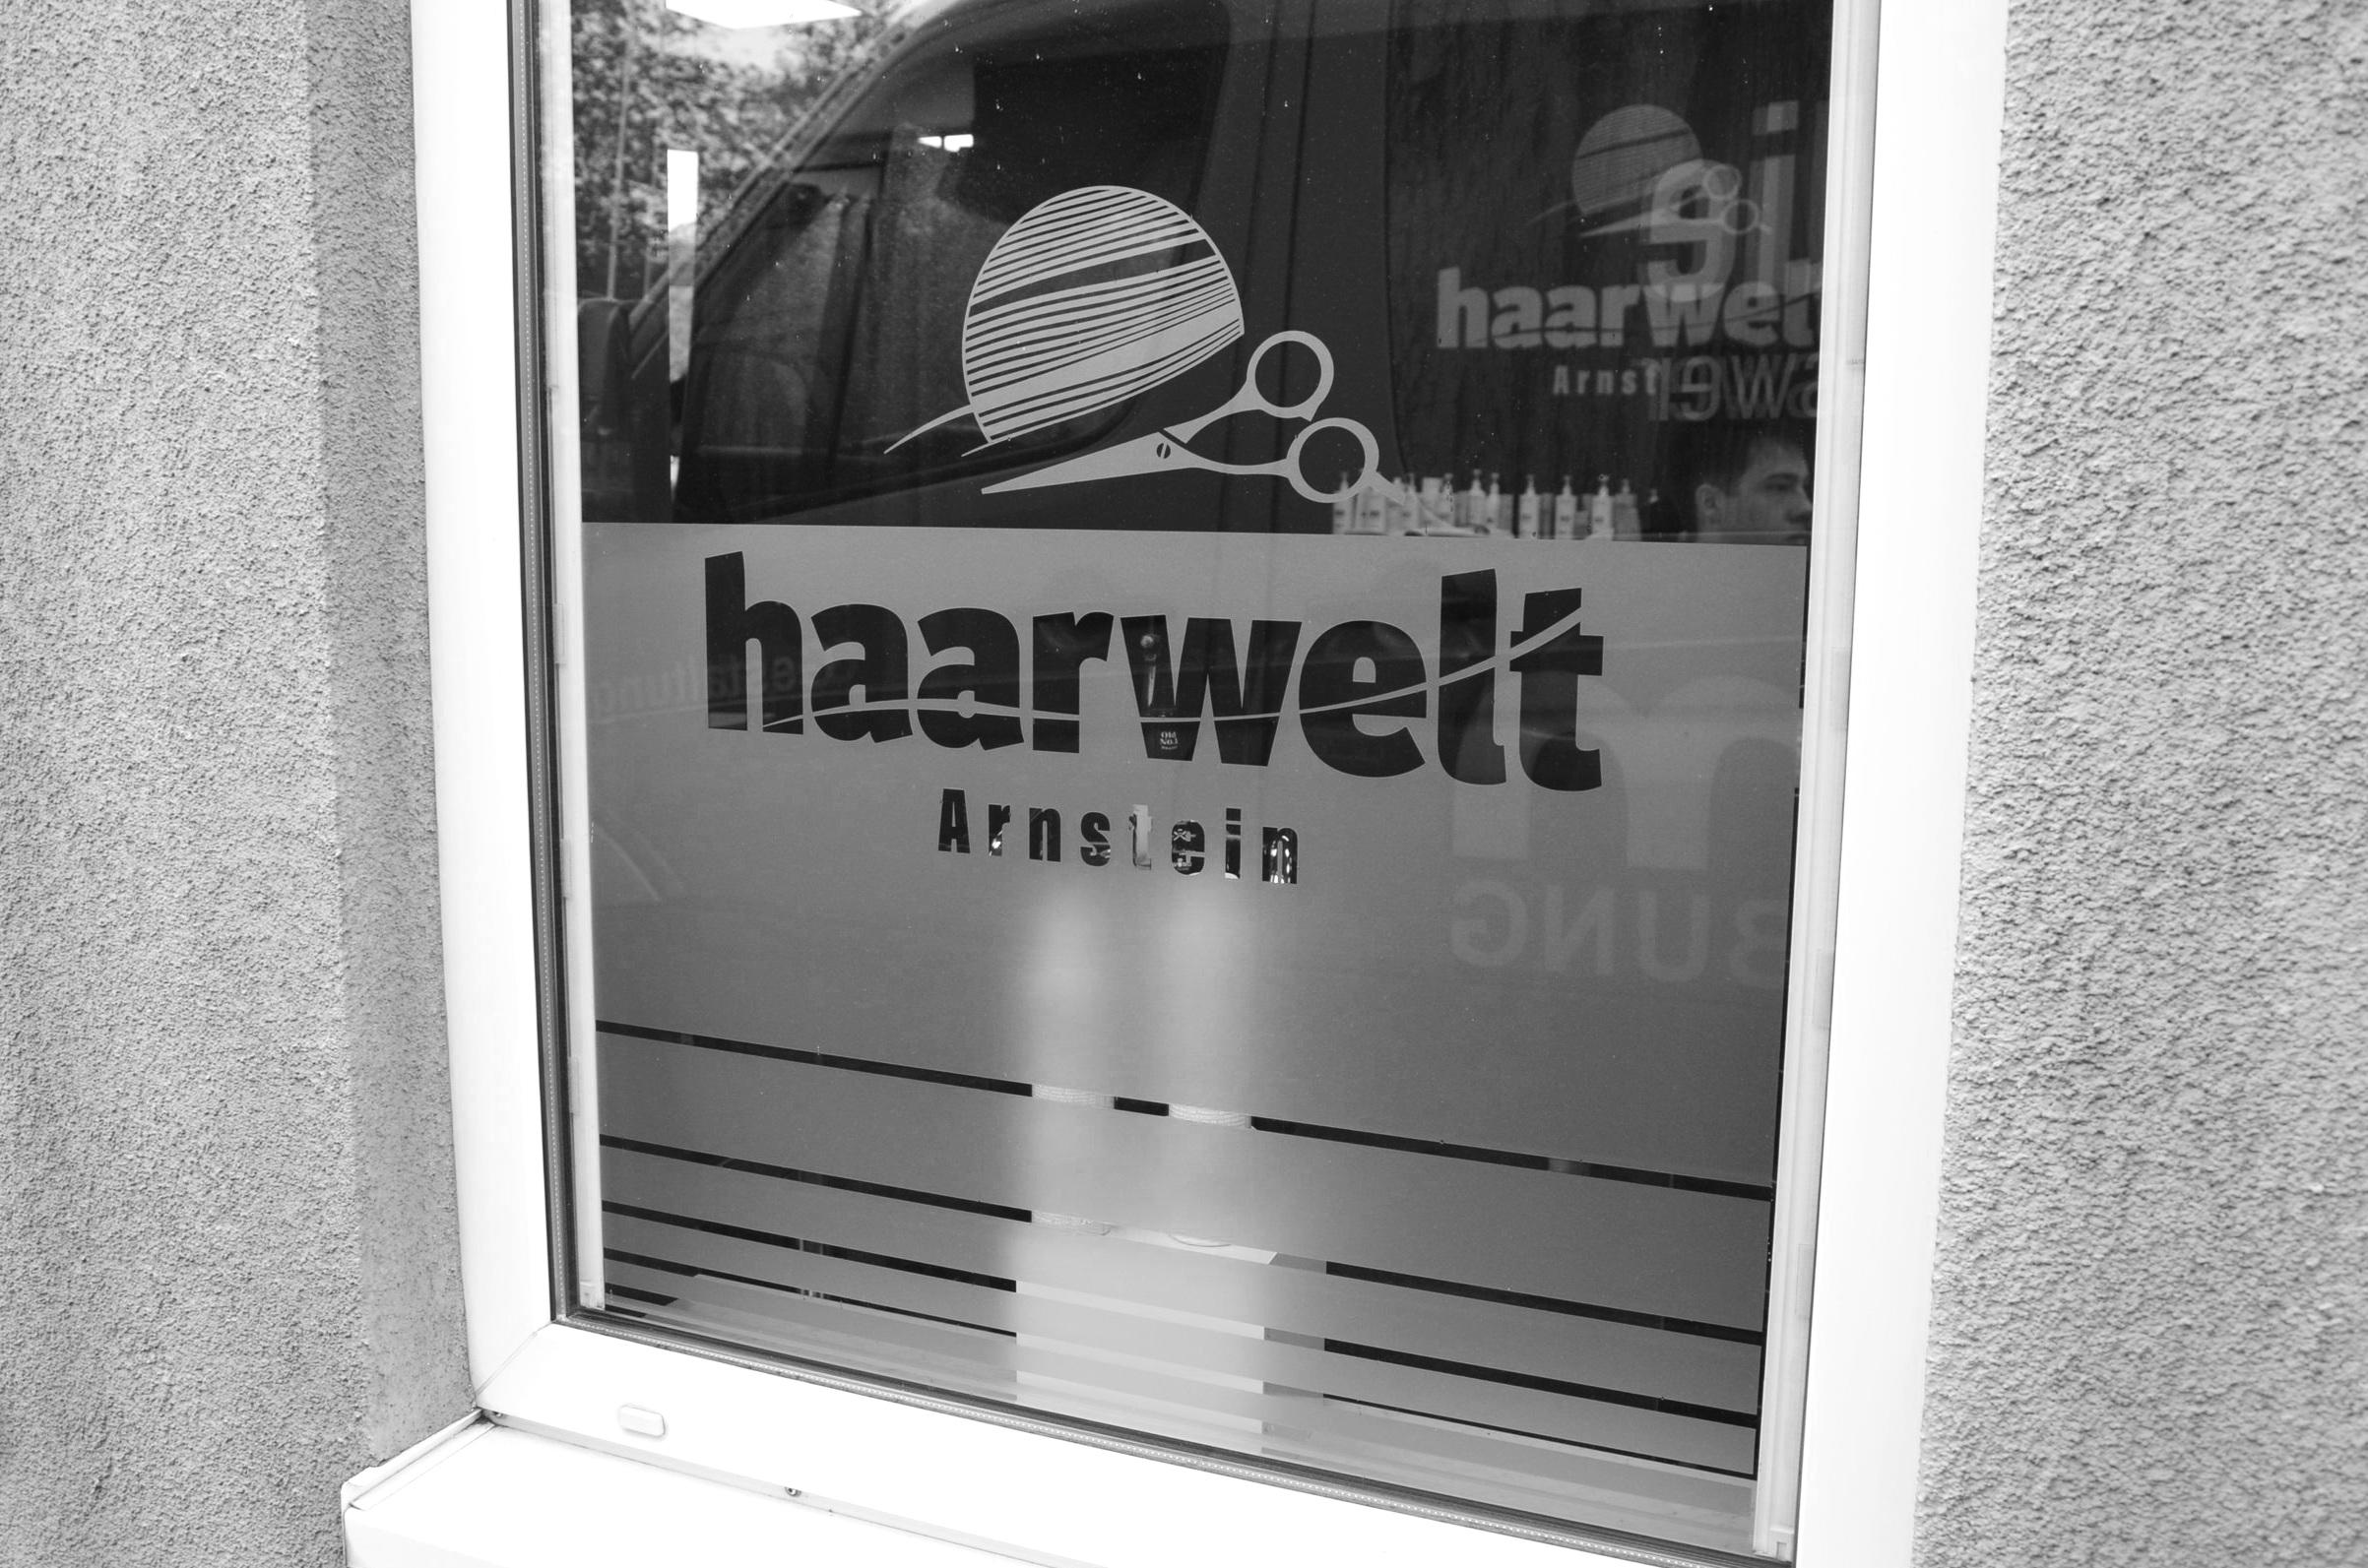 Haarwelt-Friseur-Arnstein_Studio_Michael_Seidl_Design111.JPG